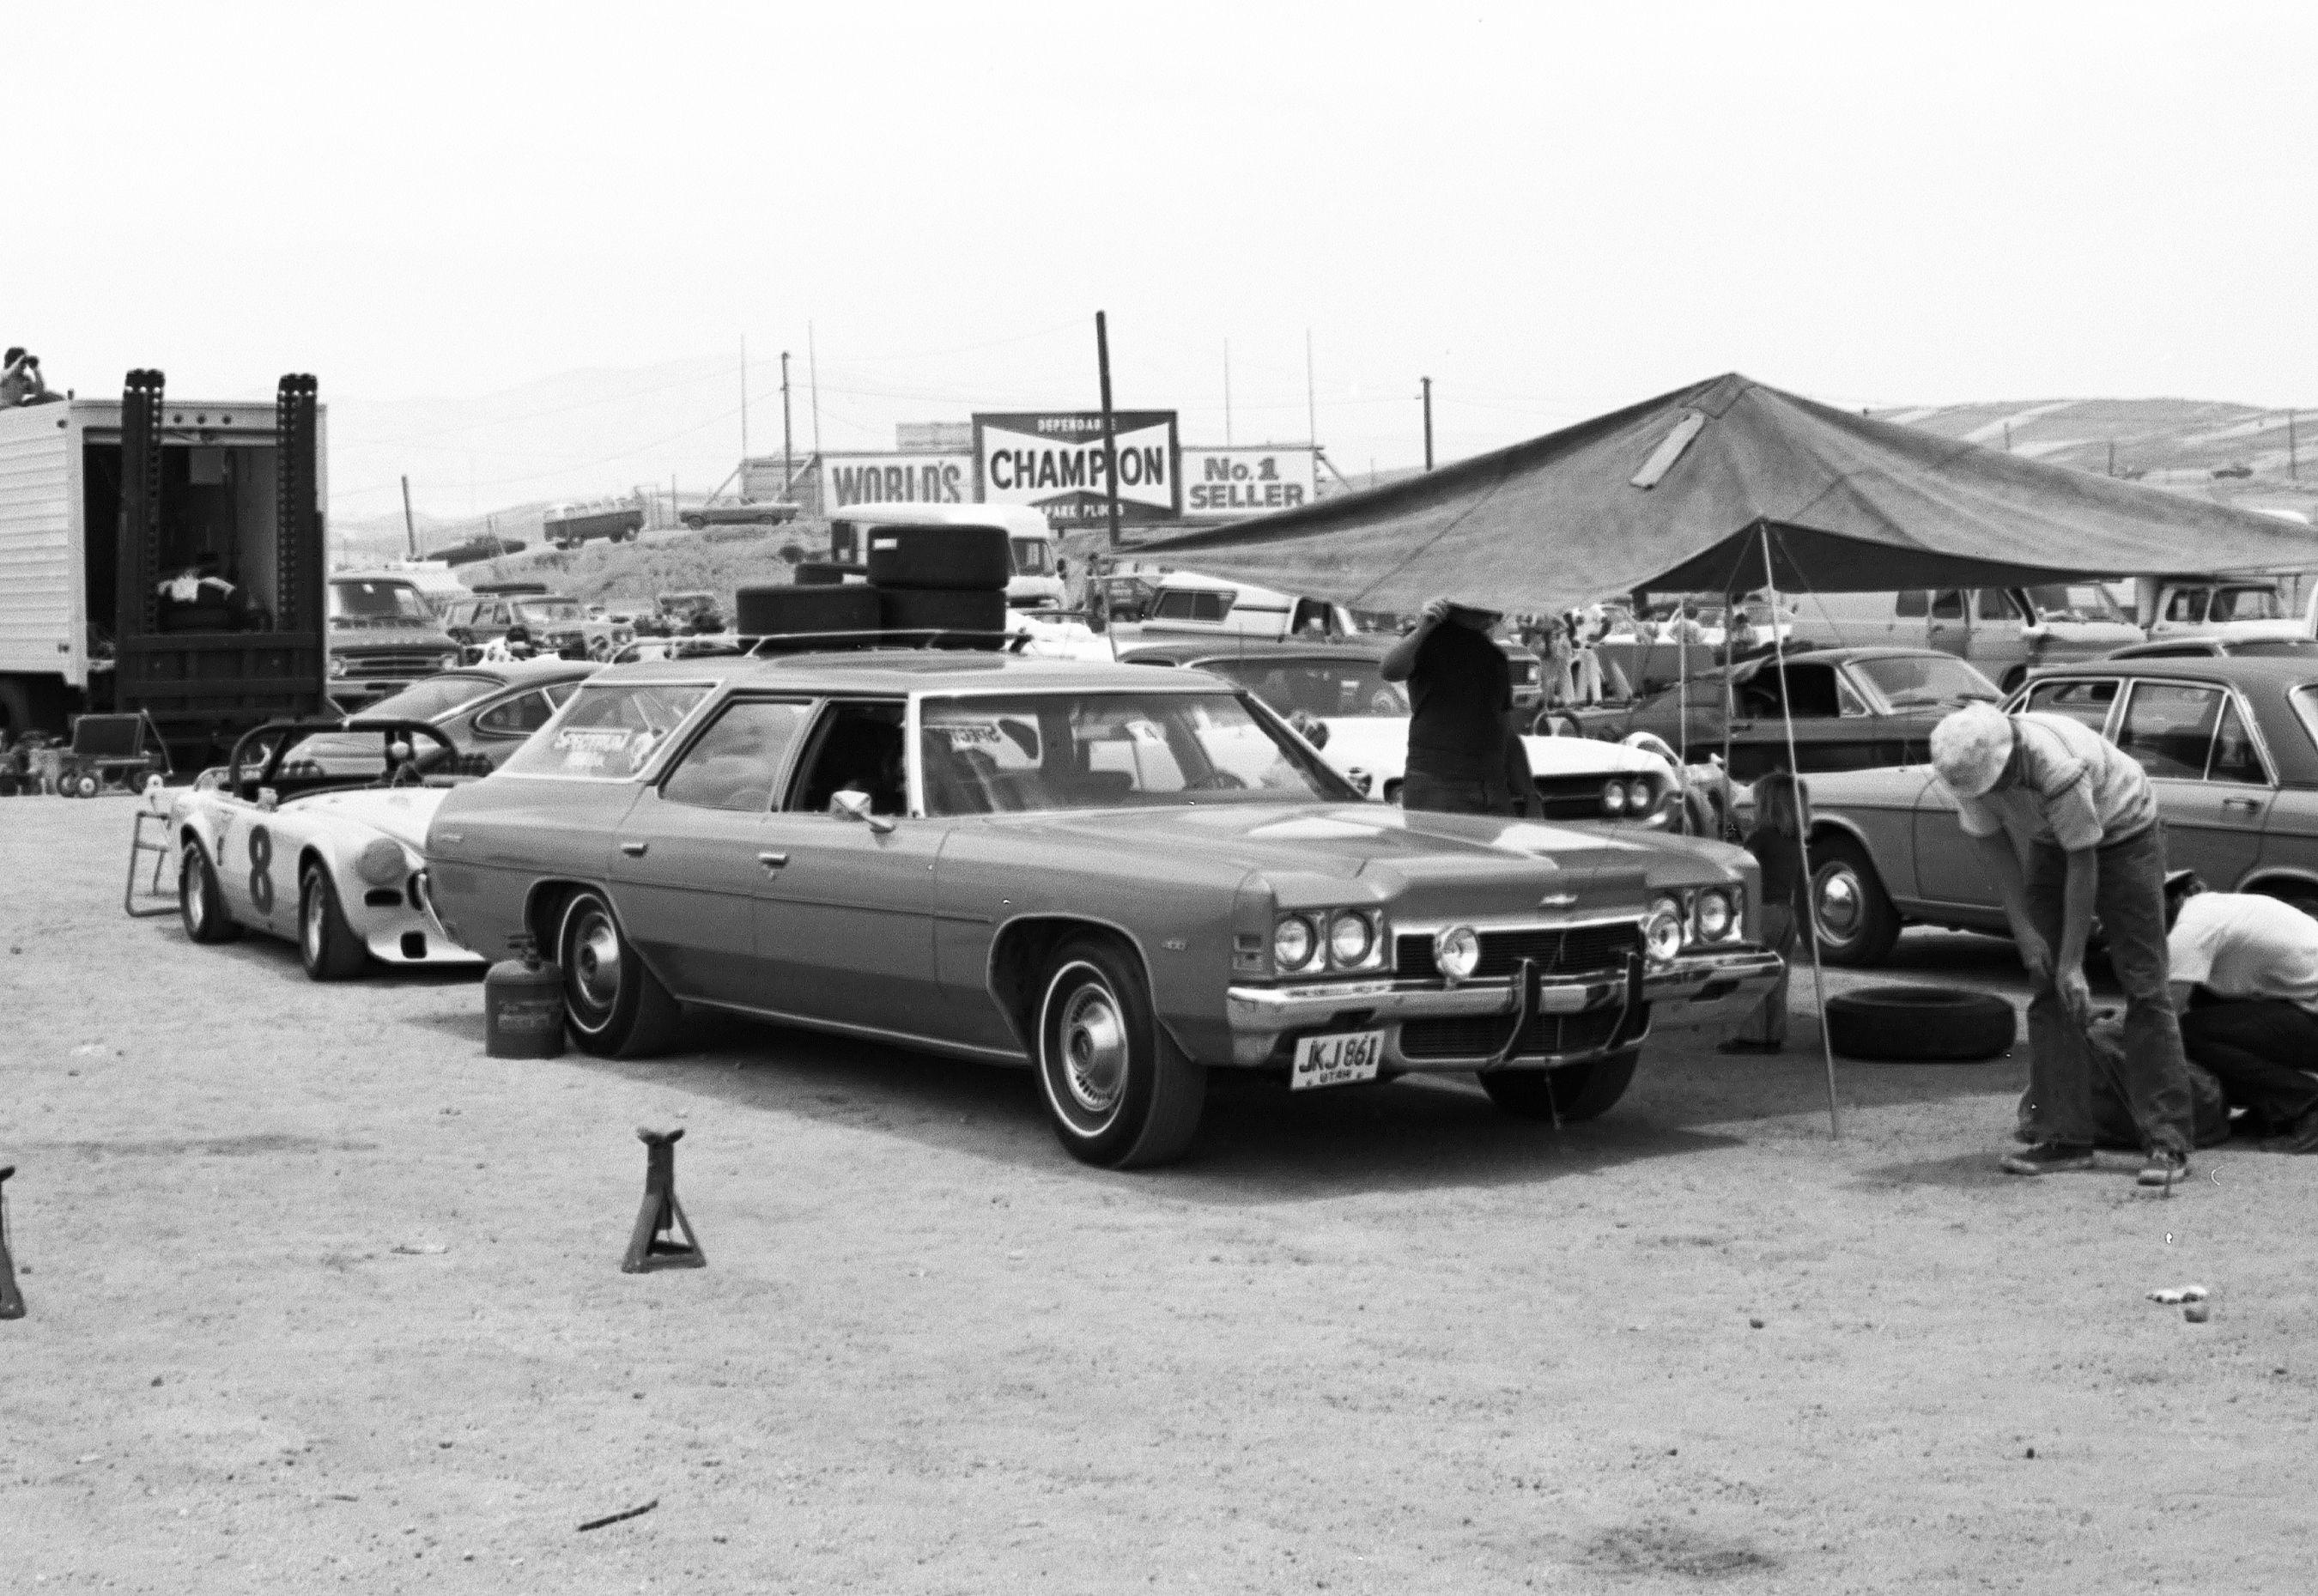 Car 30 1972 Chevrolet Townsman Wagon I Kept Trying To Use